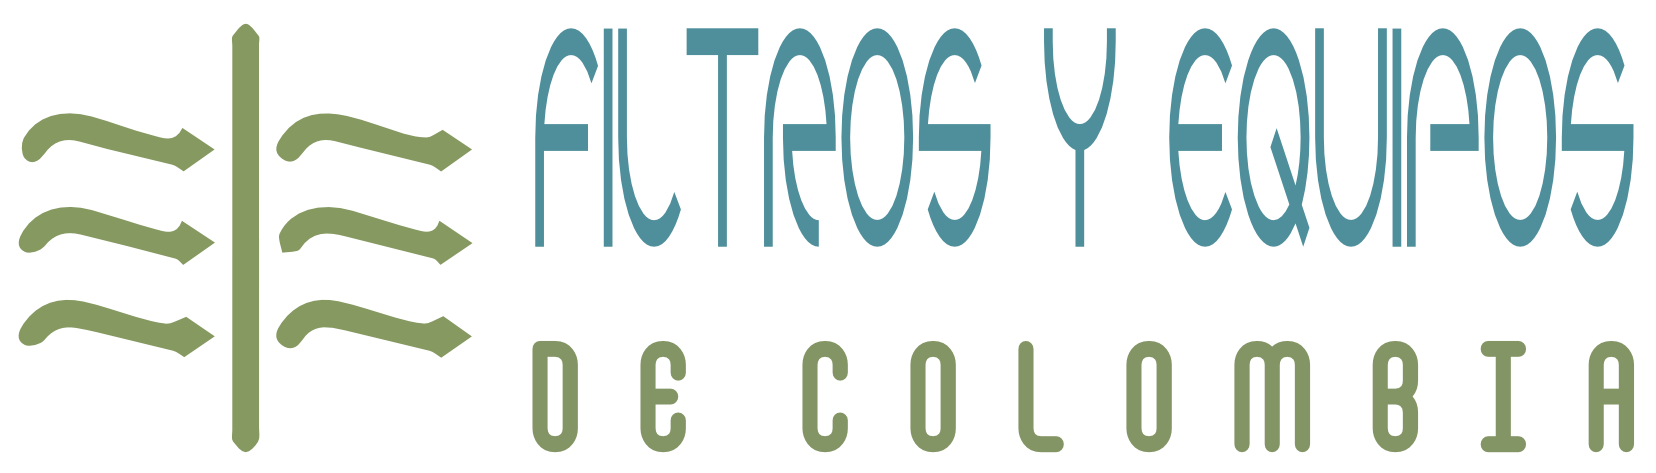 cropped-Filtros-y-Equipos-Logo-PNG-2020.png